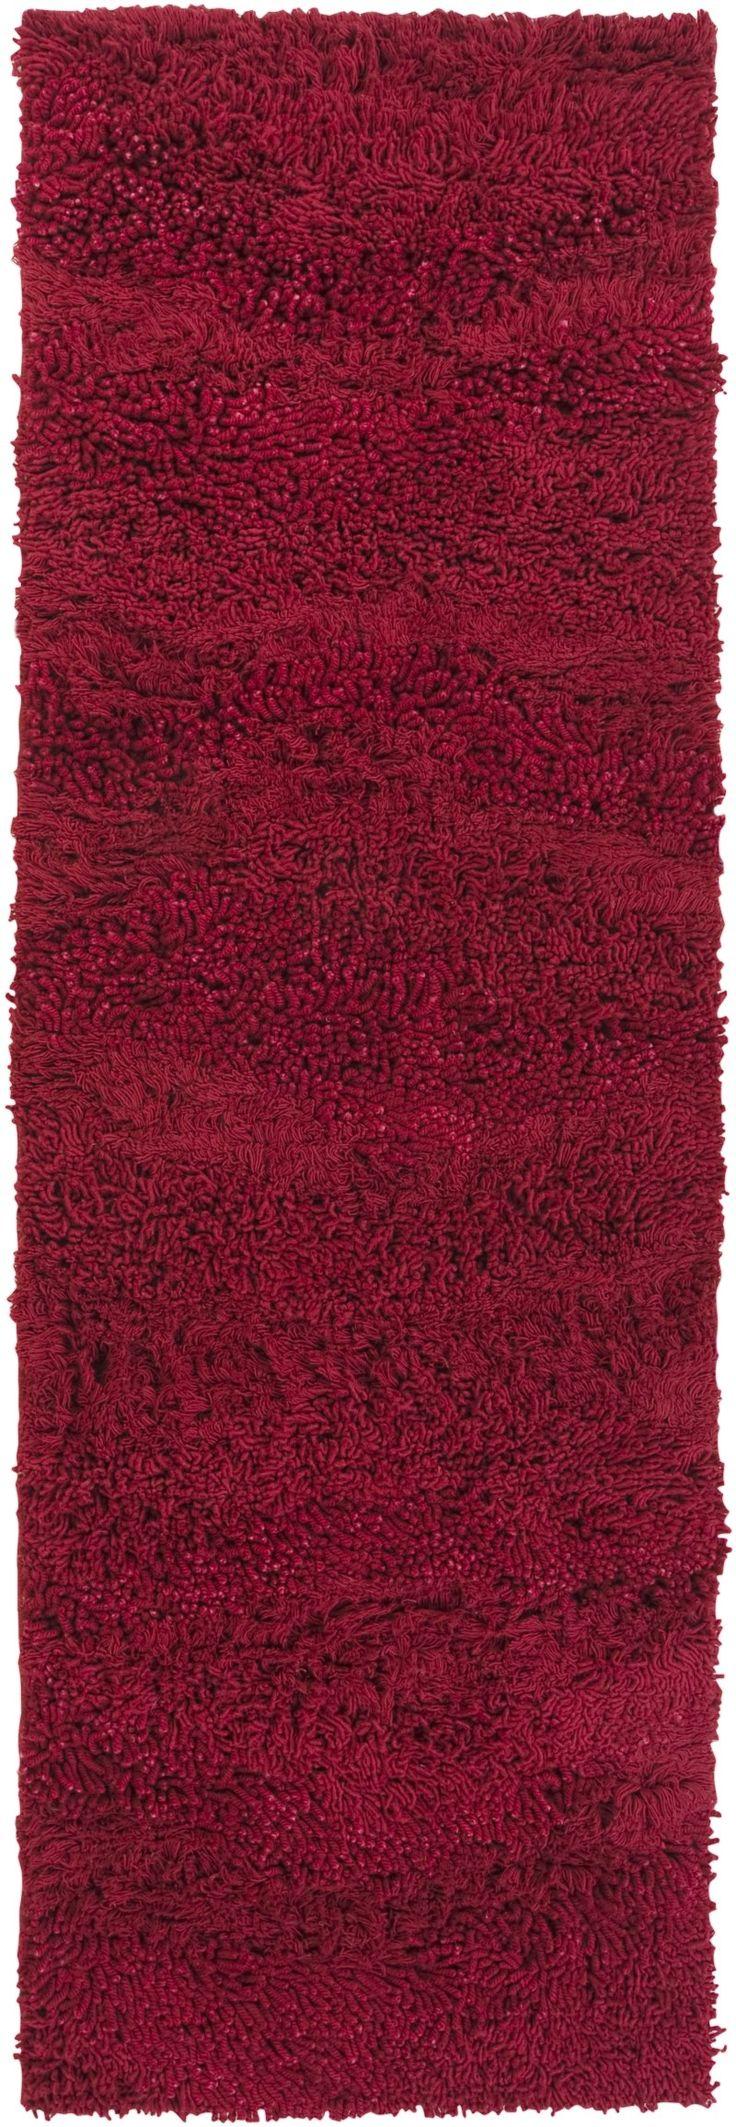 Kempton polyester area rug burgundy merlot colored 3 x3 area rugs - Kempton Polyester Area Rug Burgundy Merlot Colored 3 X3 Area Rugs Surya Berkley Brk 3301 Download